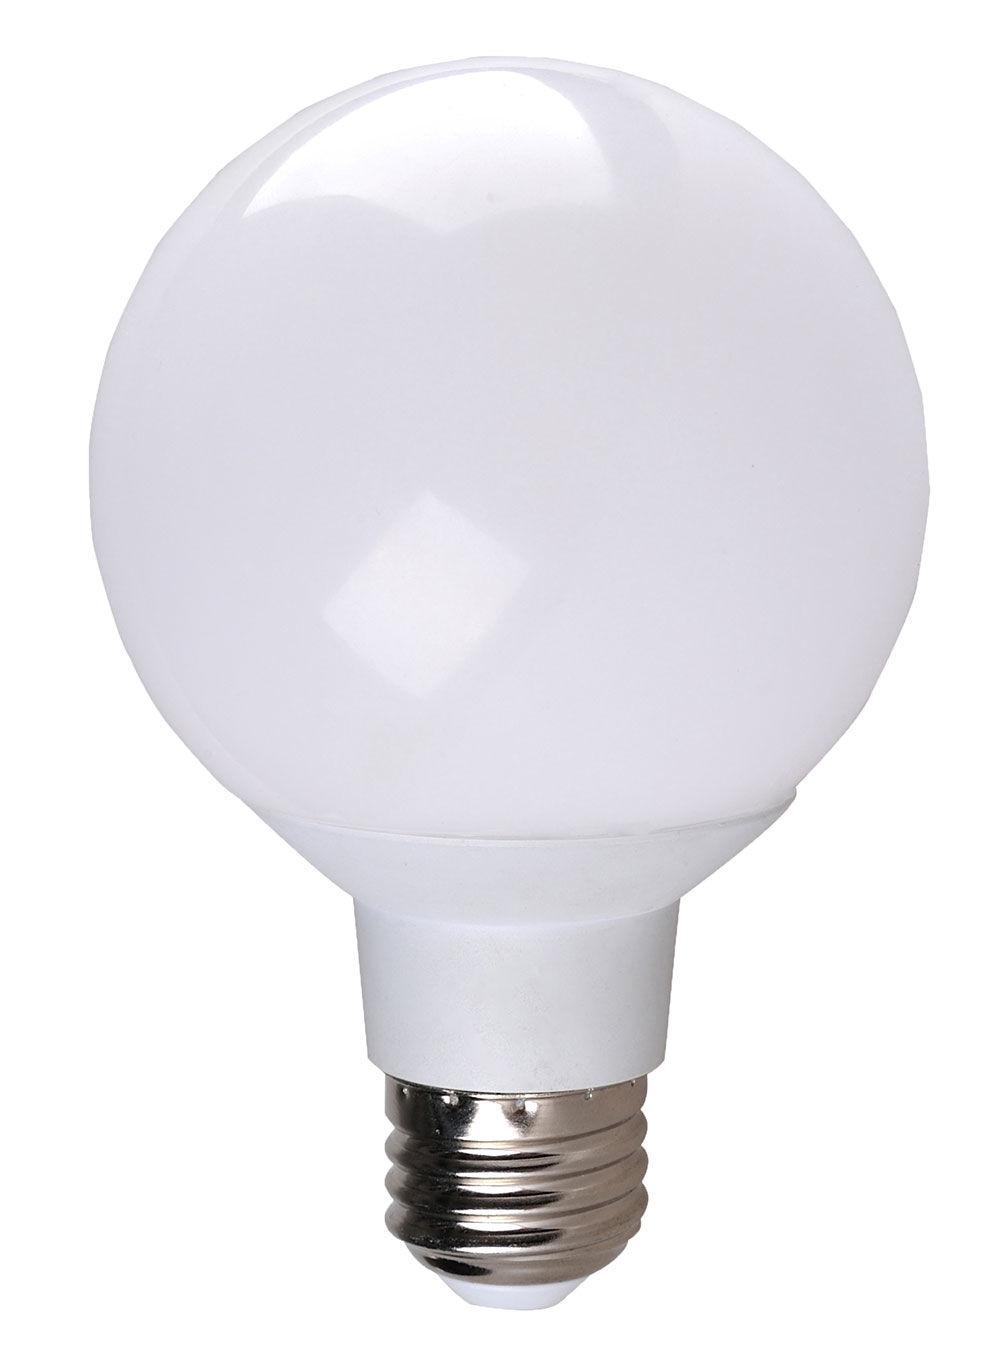 Is It Safe To Leave A Light Bulb Socket Empty • Bulbs Ideas